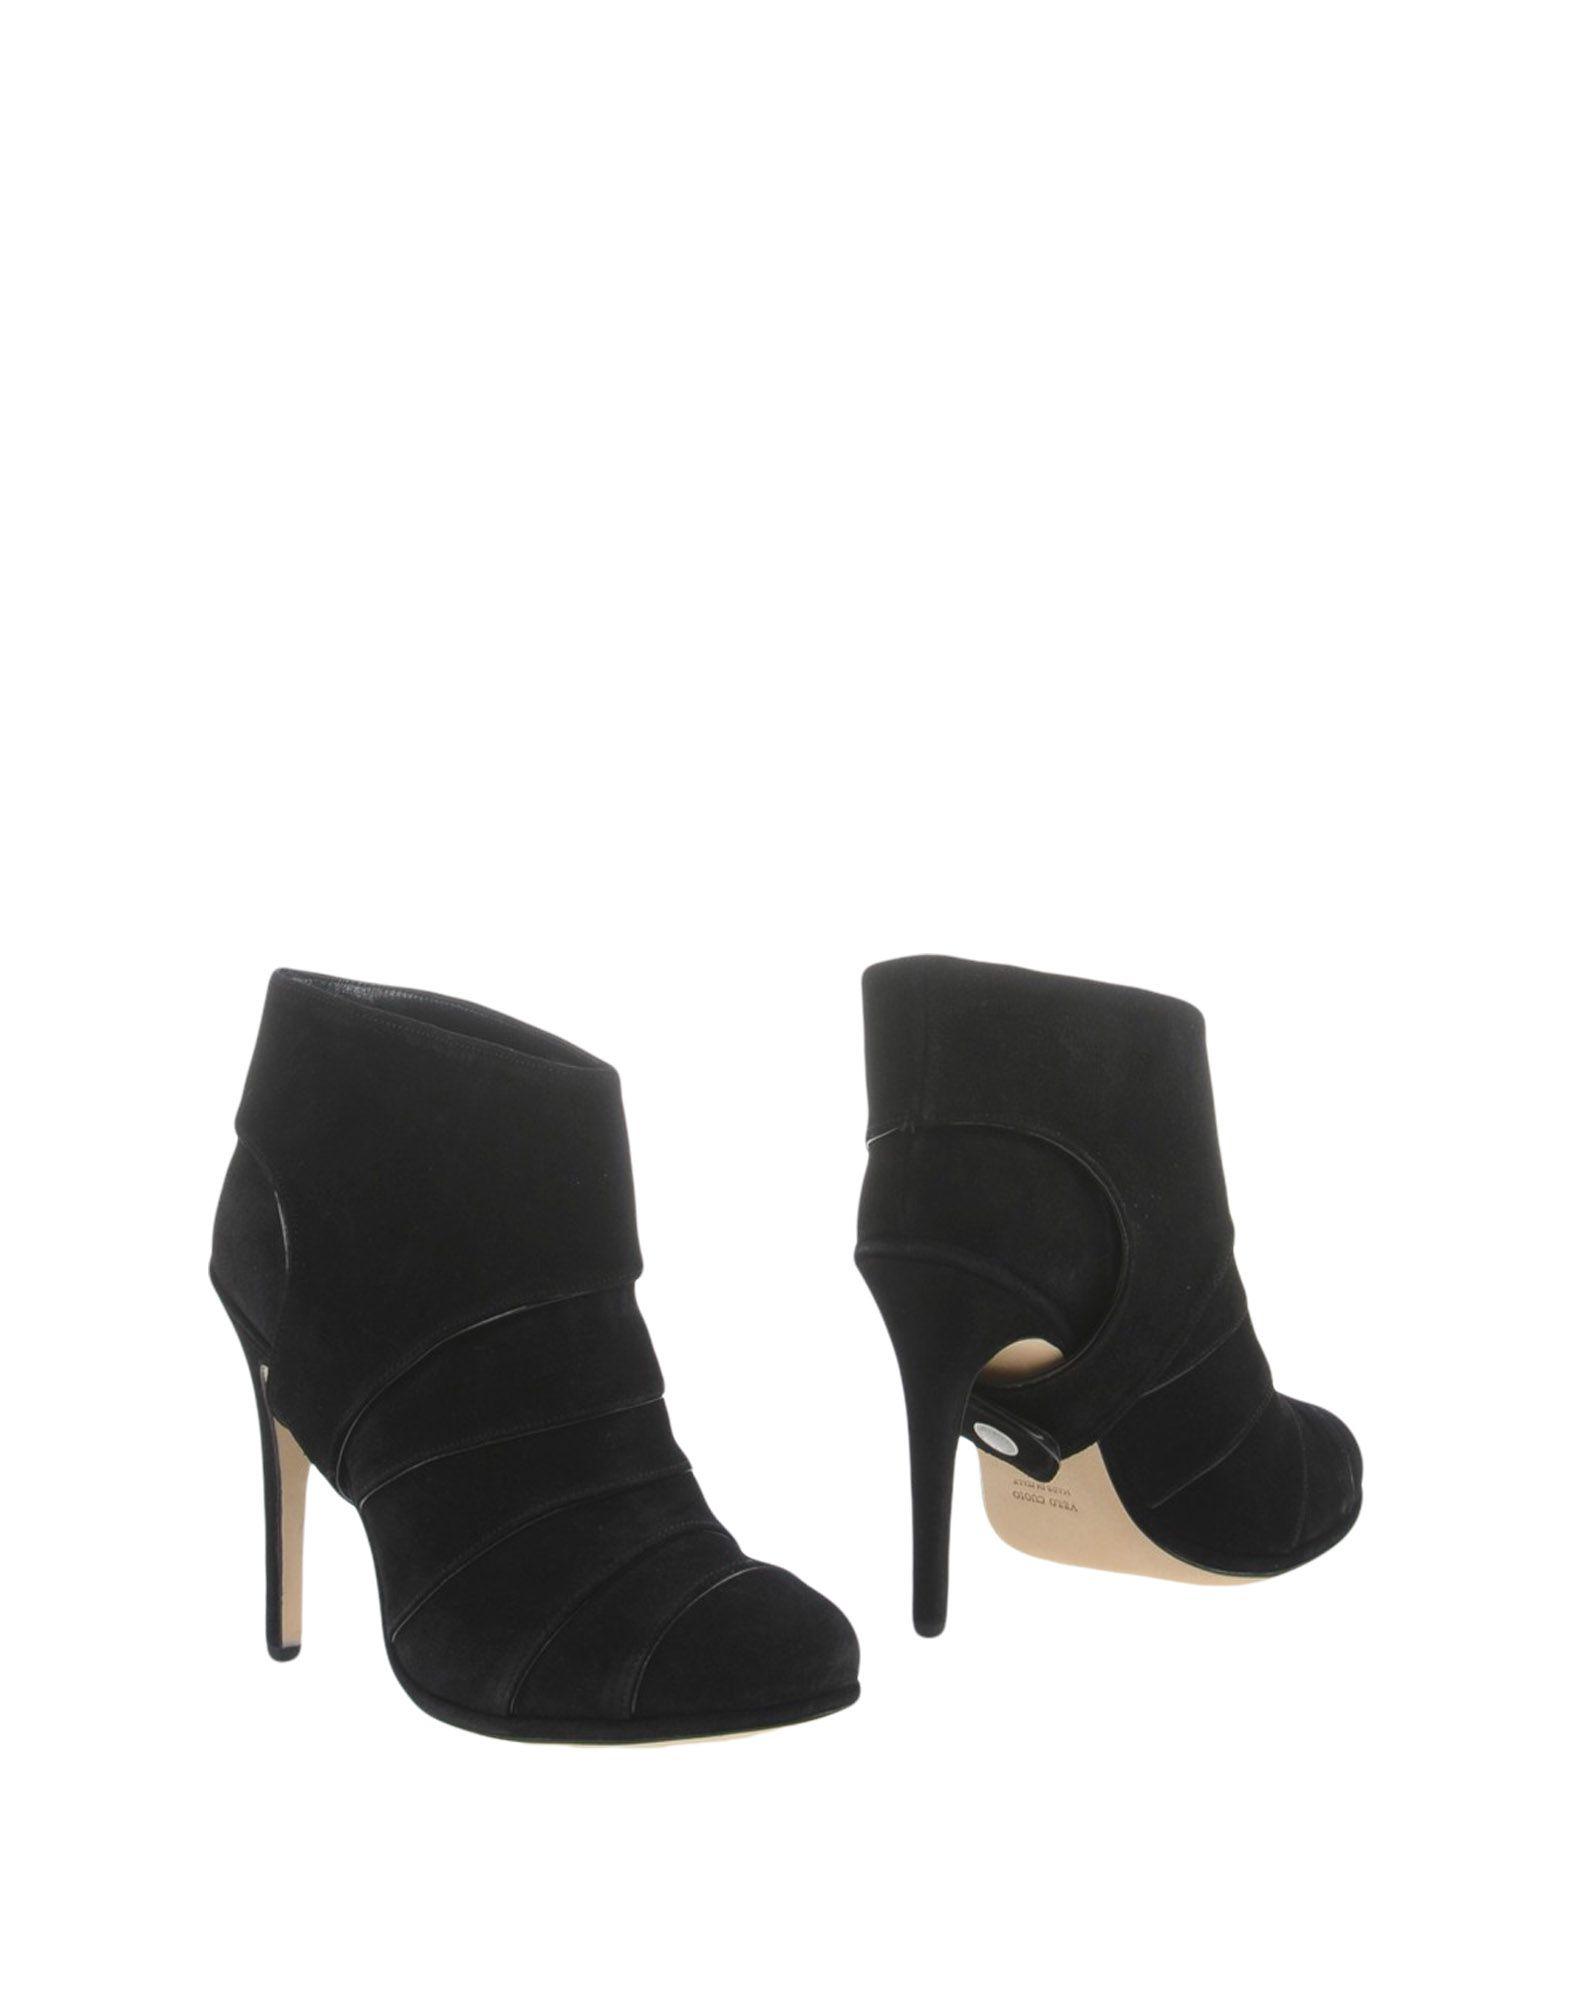 Stilvolle billige Schuhe Neil Barrett 11328869BR Stiefelette Damen  11328869BR Barrett 4a9f05